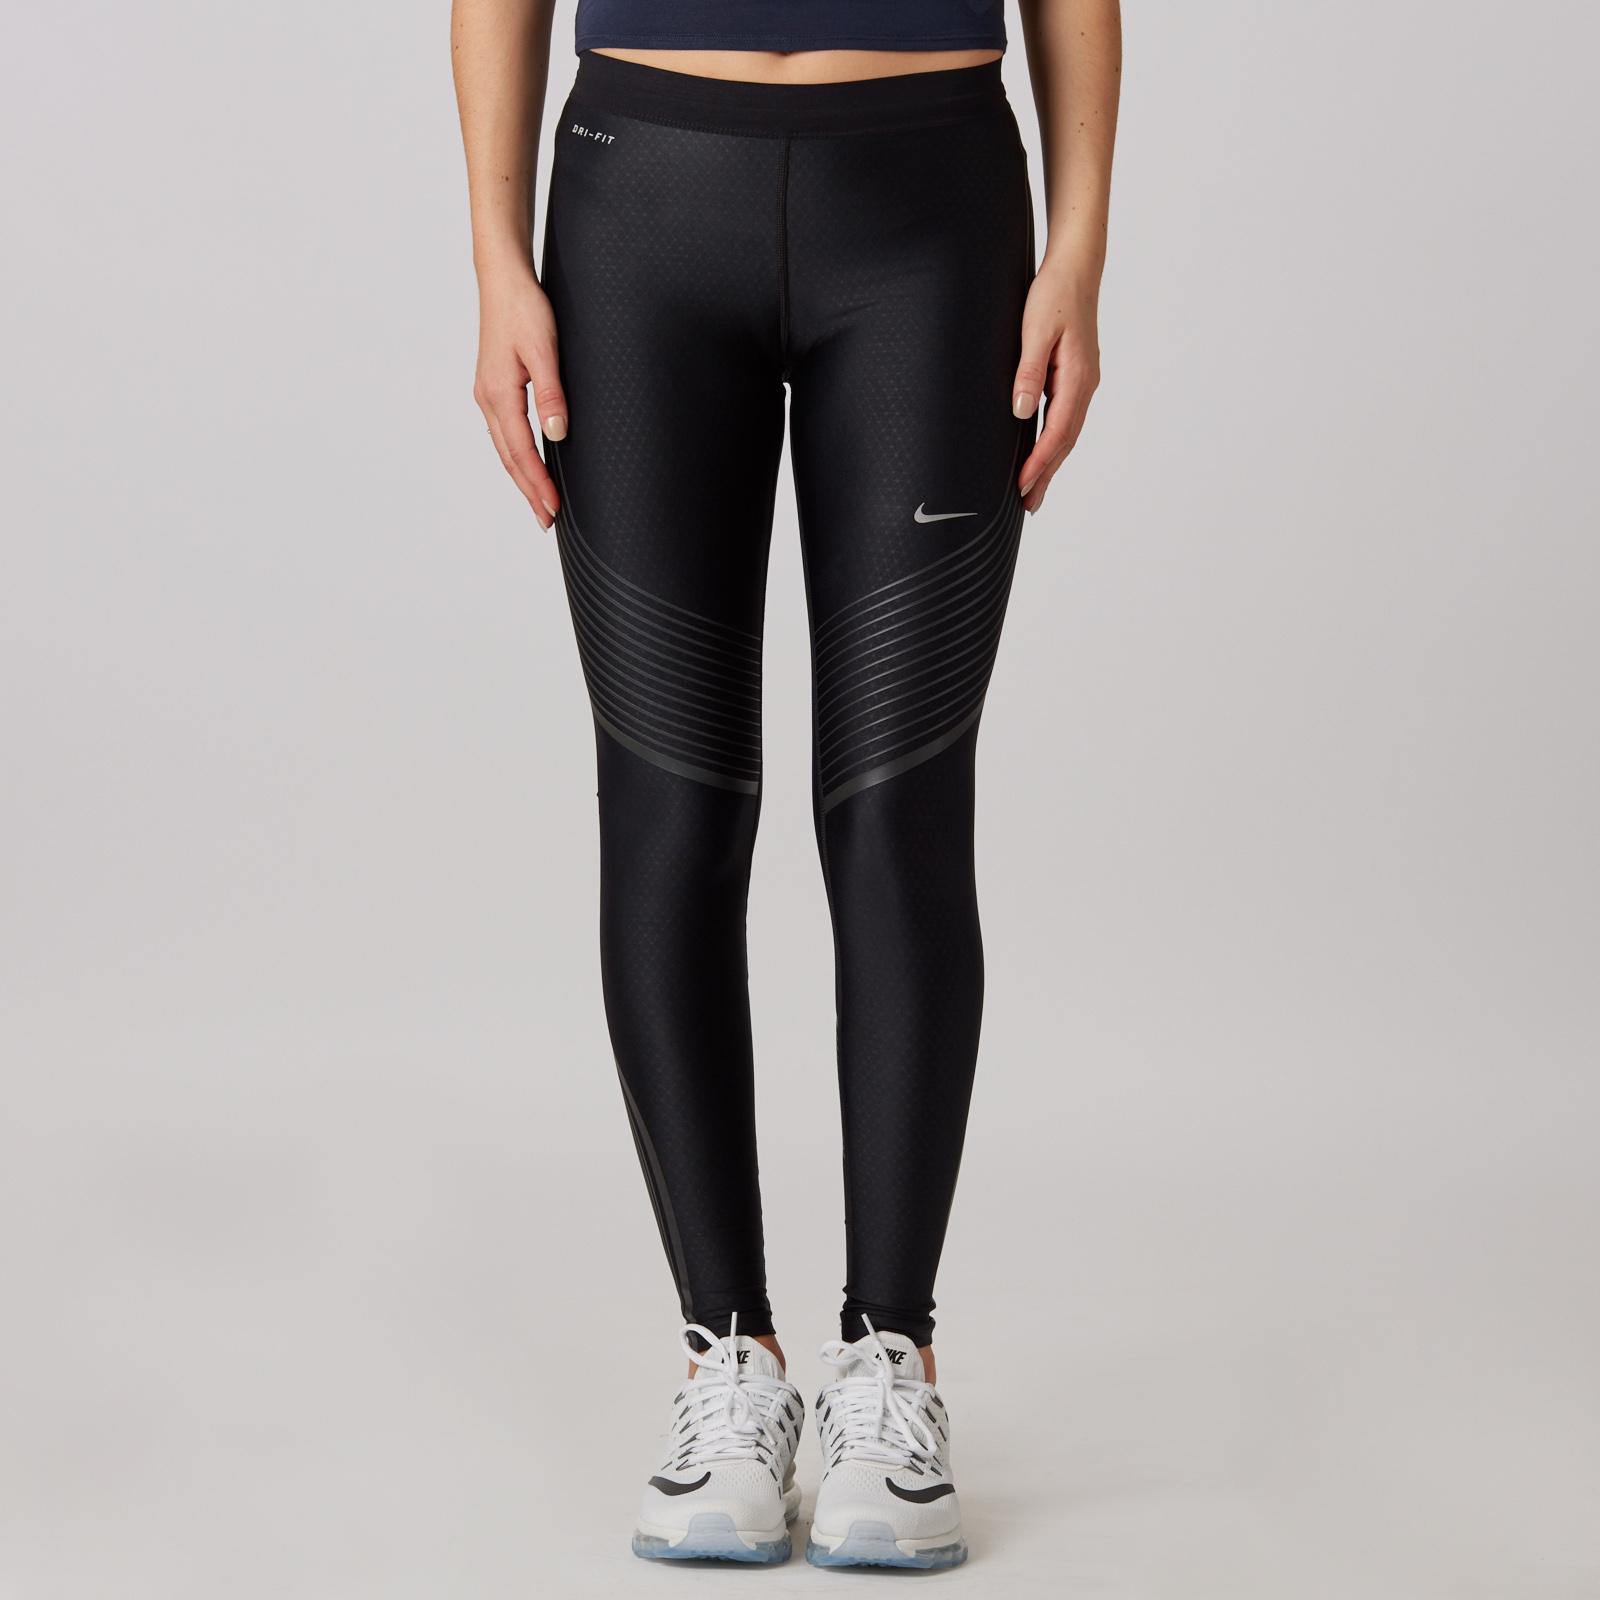 Nike Power Speed Tight - 719784-010 - Sneakersnstuff  c0a05283f